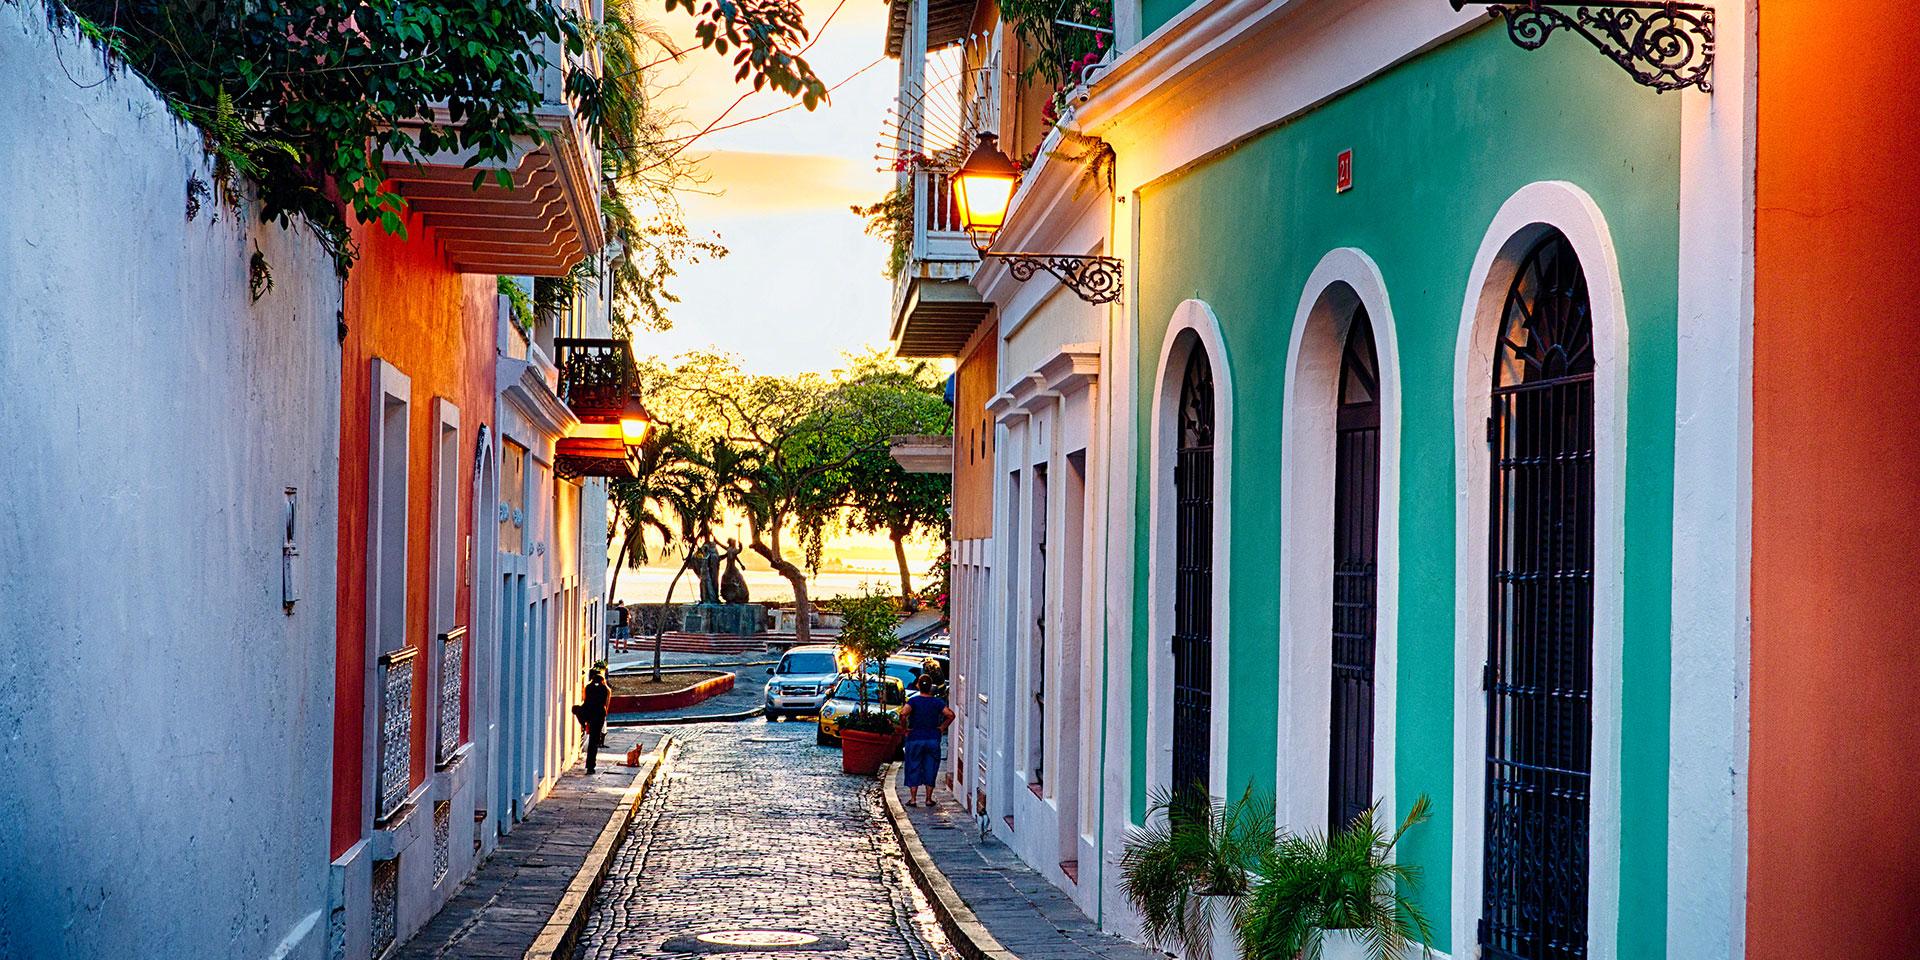 Amsteram naar Puerto Rico (San Juan) feb 2022